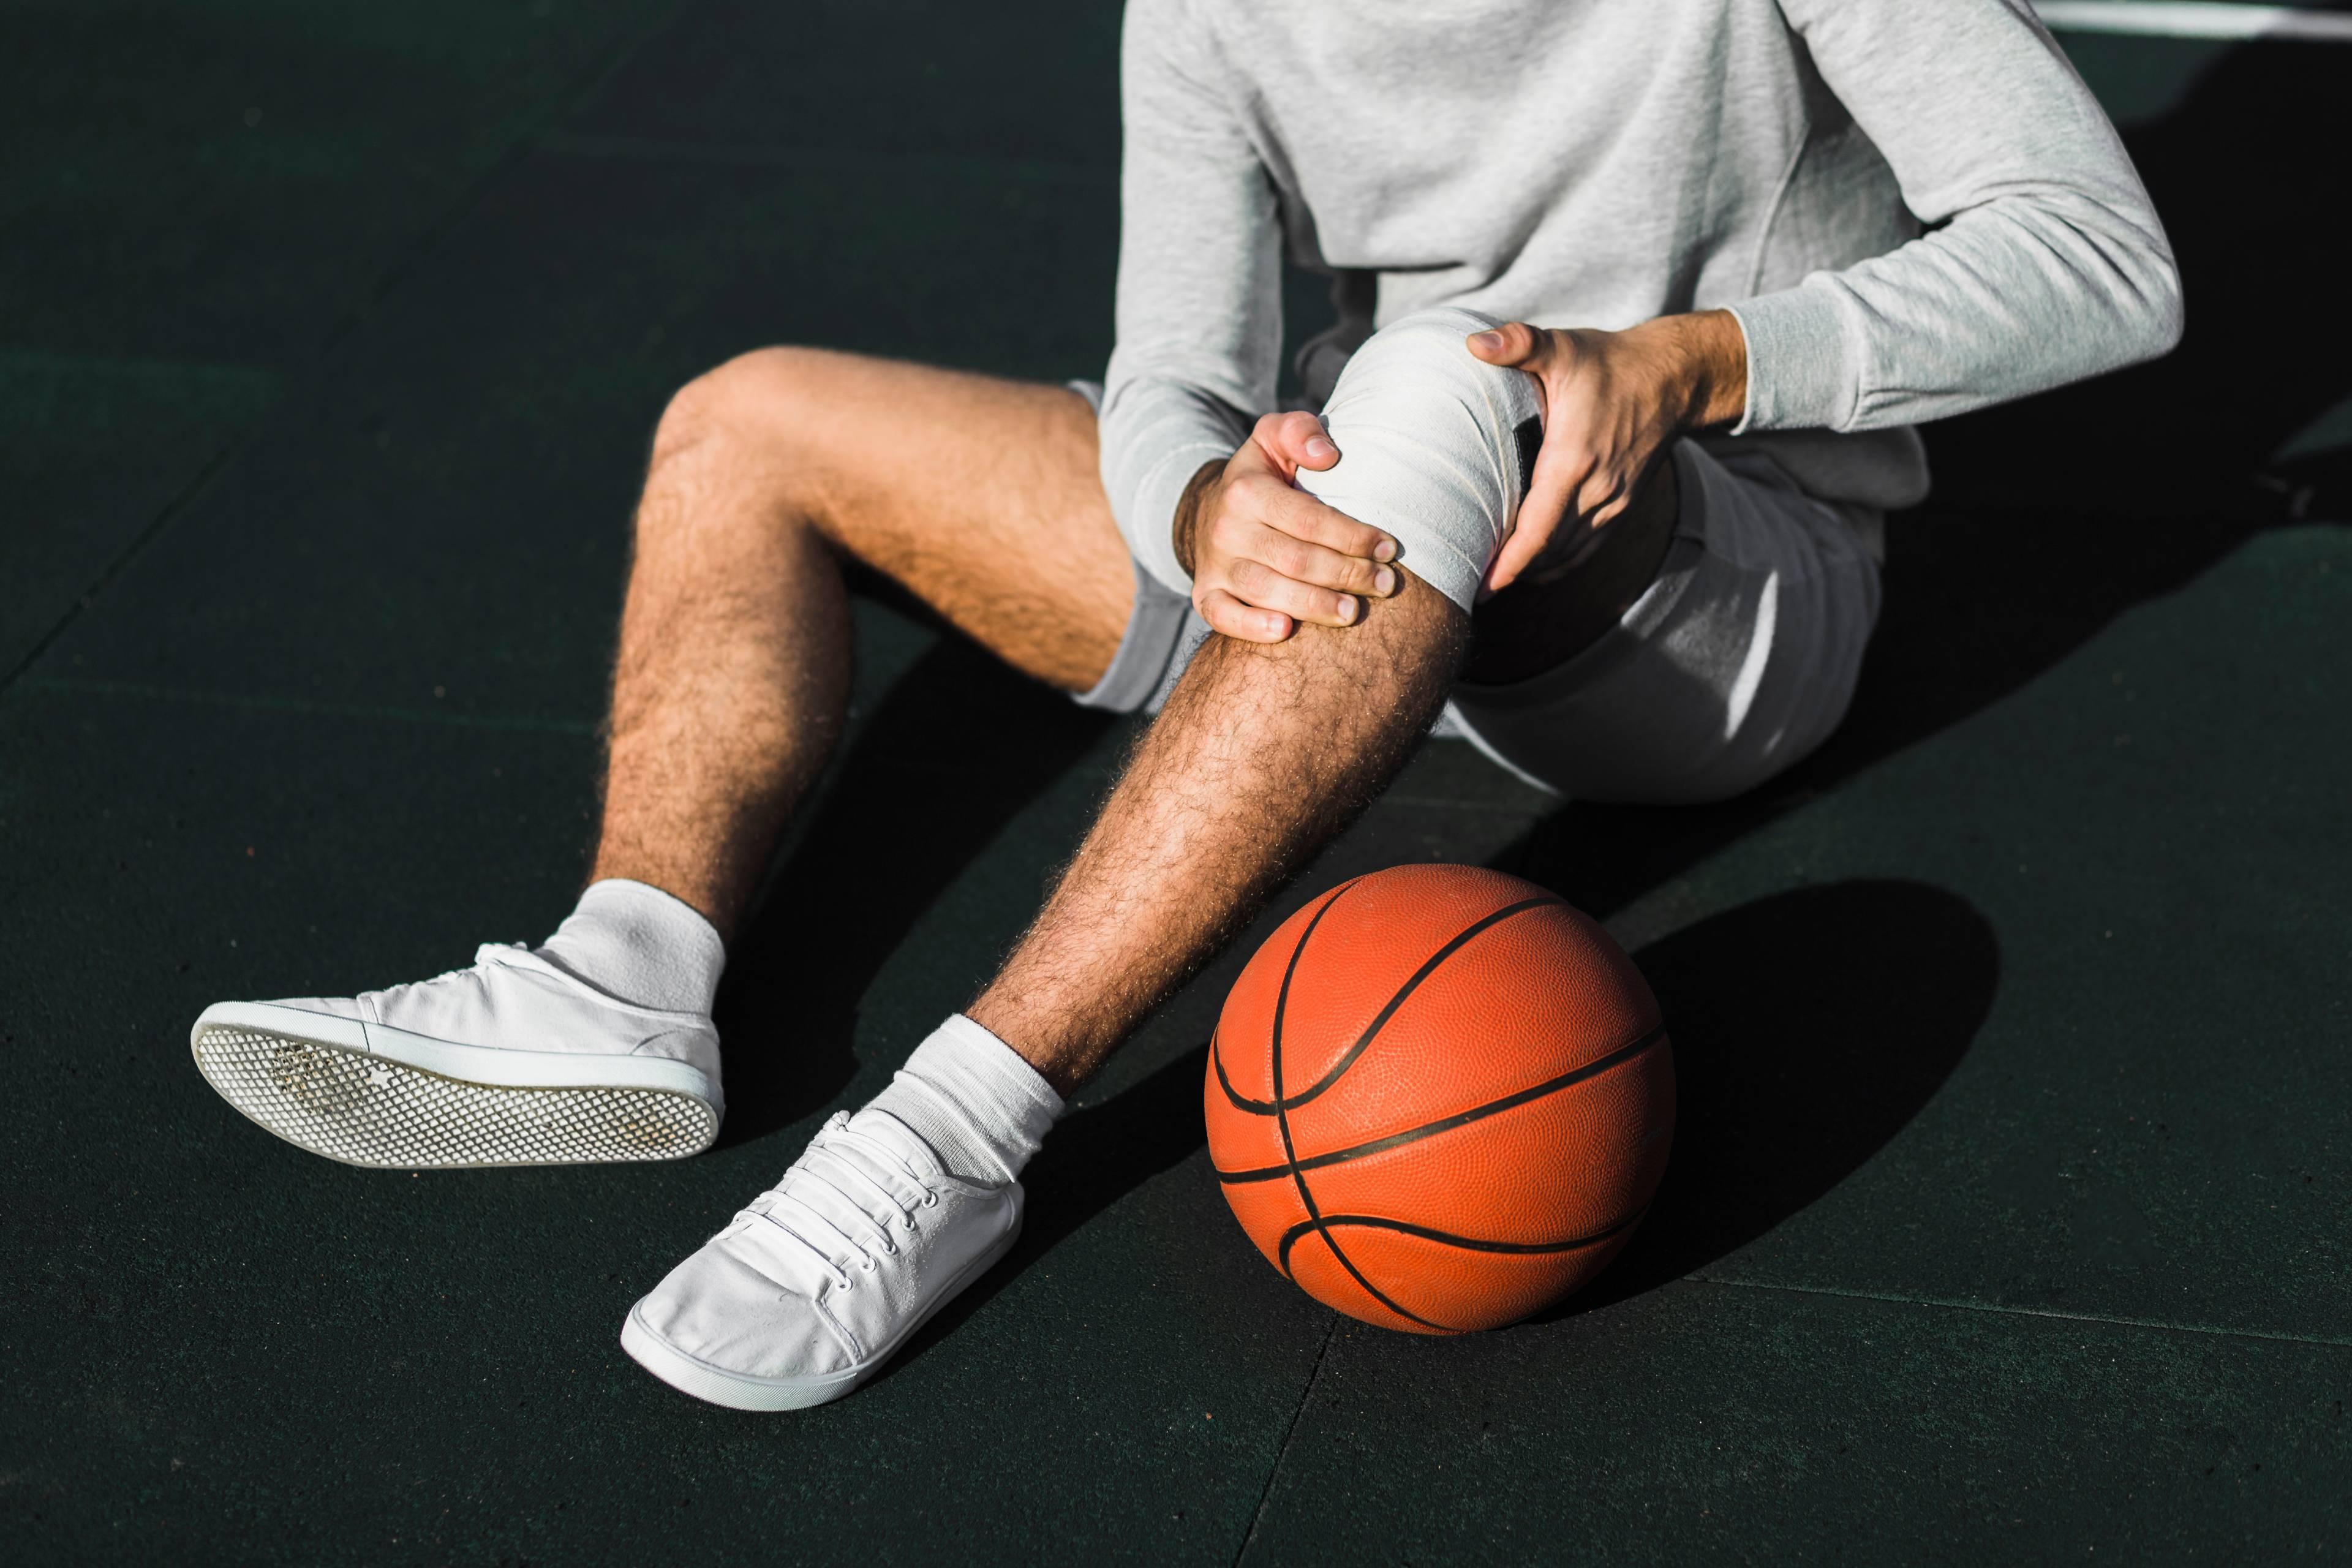 basketball : blessure au genou